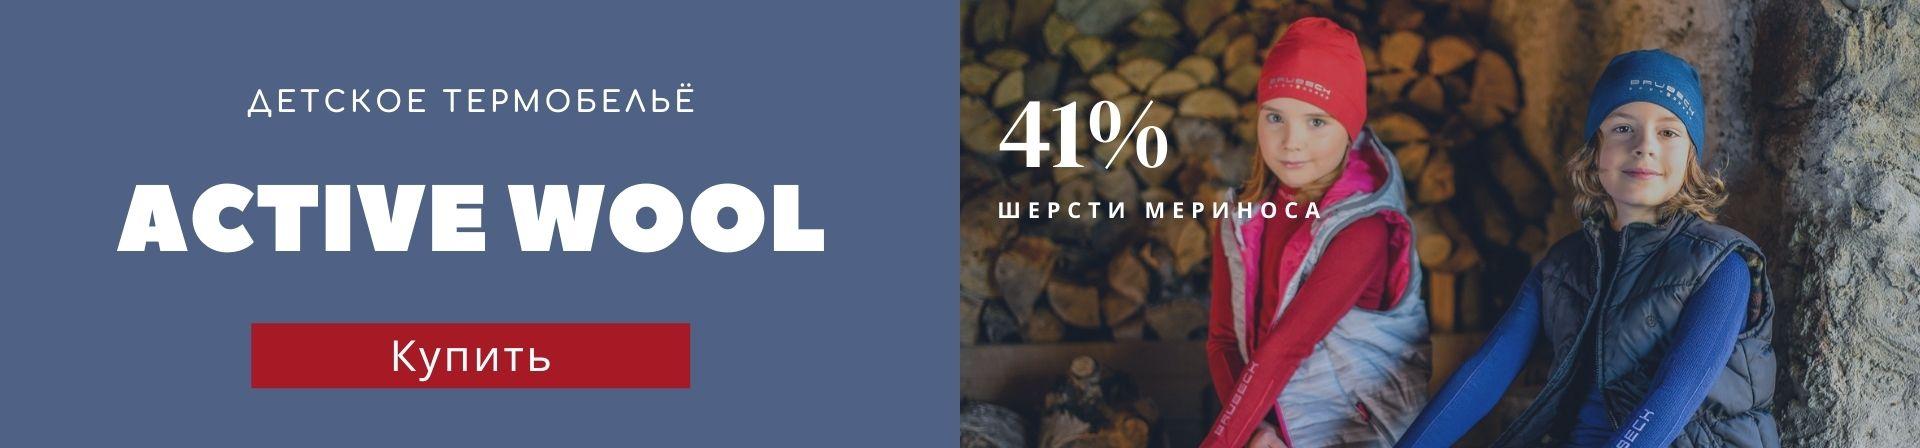 ������� ���������� 41% ������ �������� Active Wool